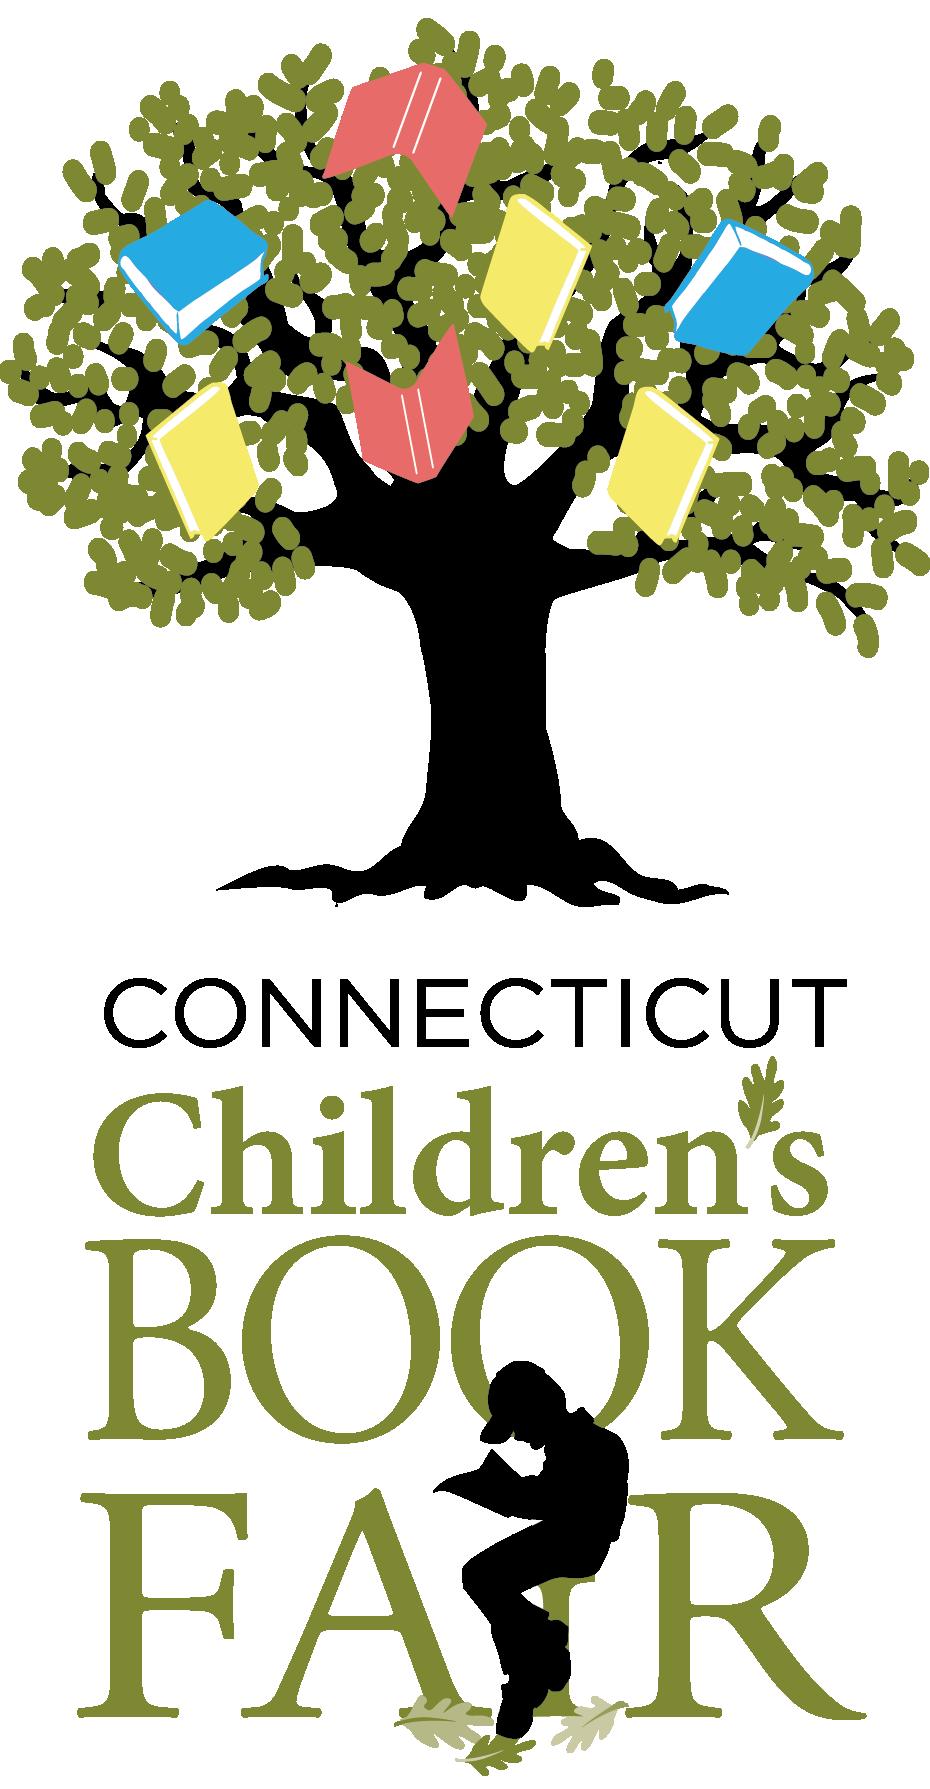 Book fair clipart free banner stock Home | Connecticut Childrens' Book Fair banner stock